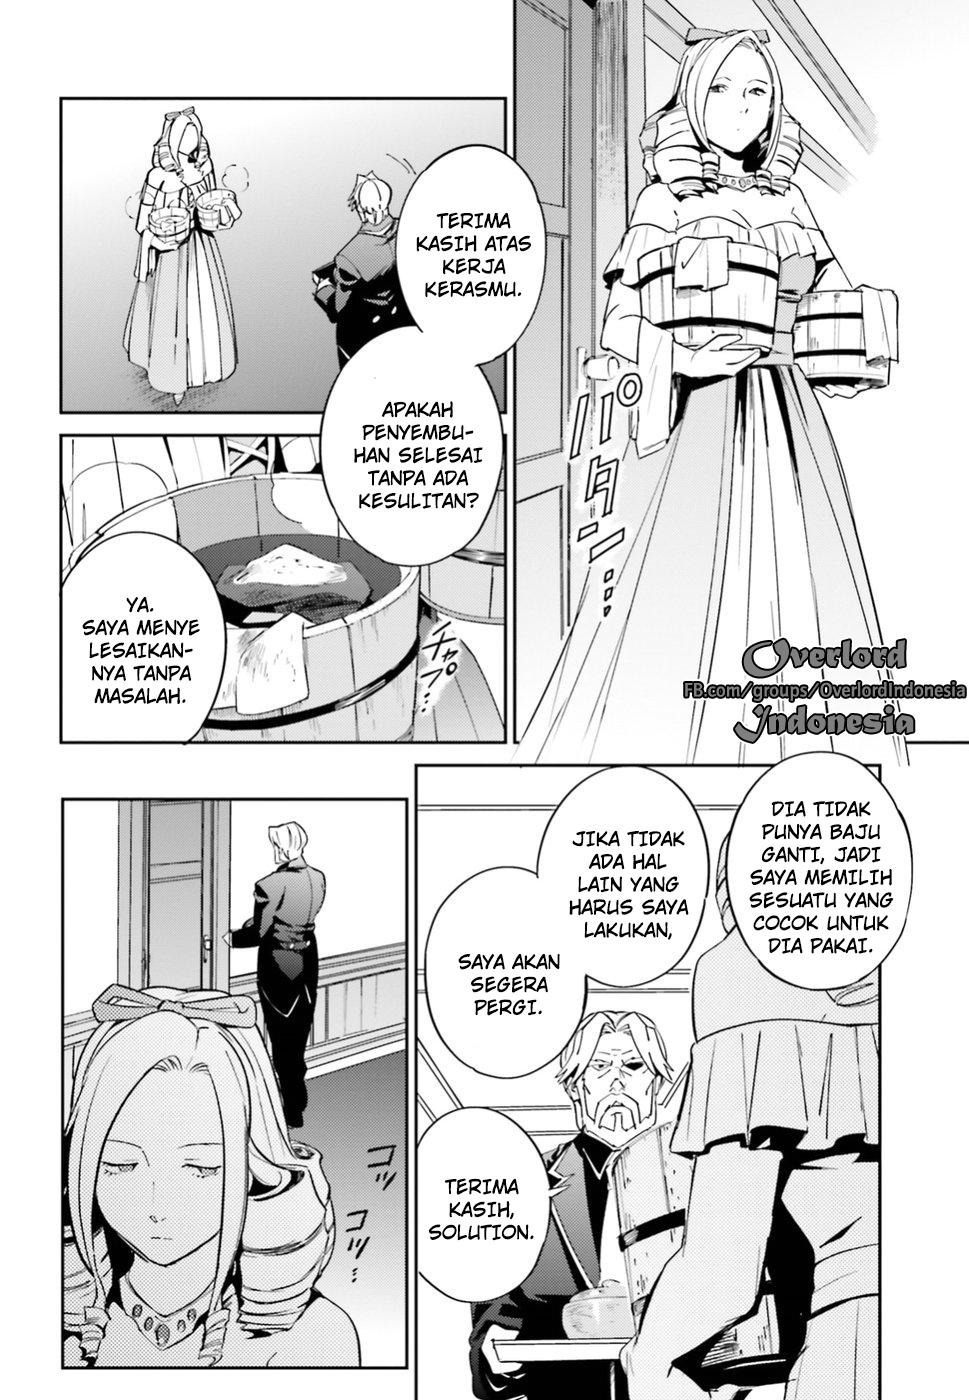 Baca Komik Overlord chapter 33 Bahasa Indonesia